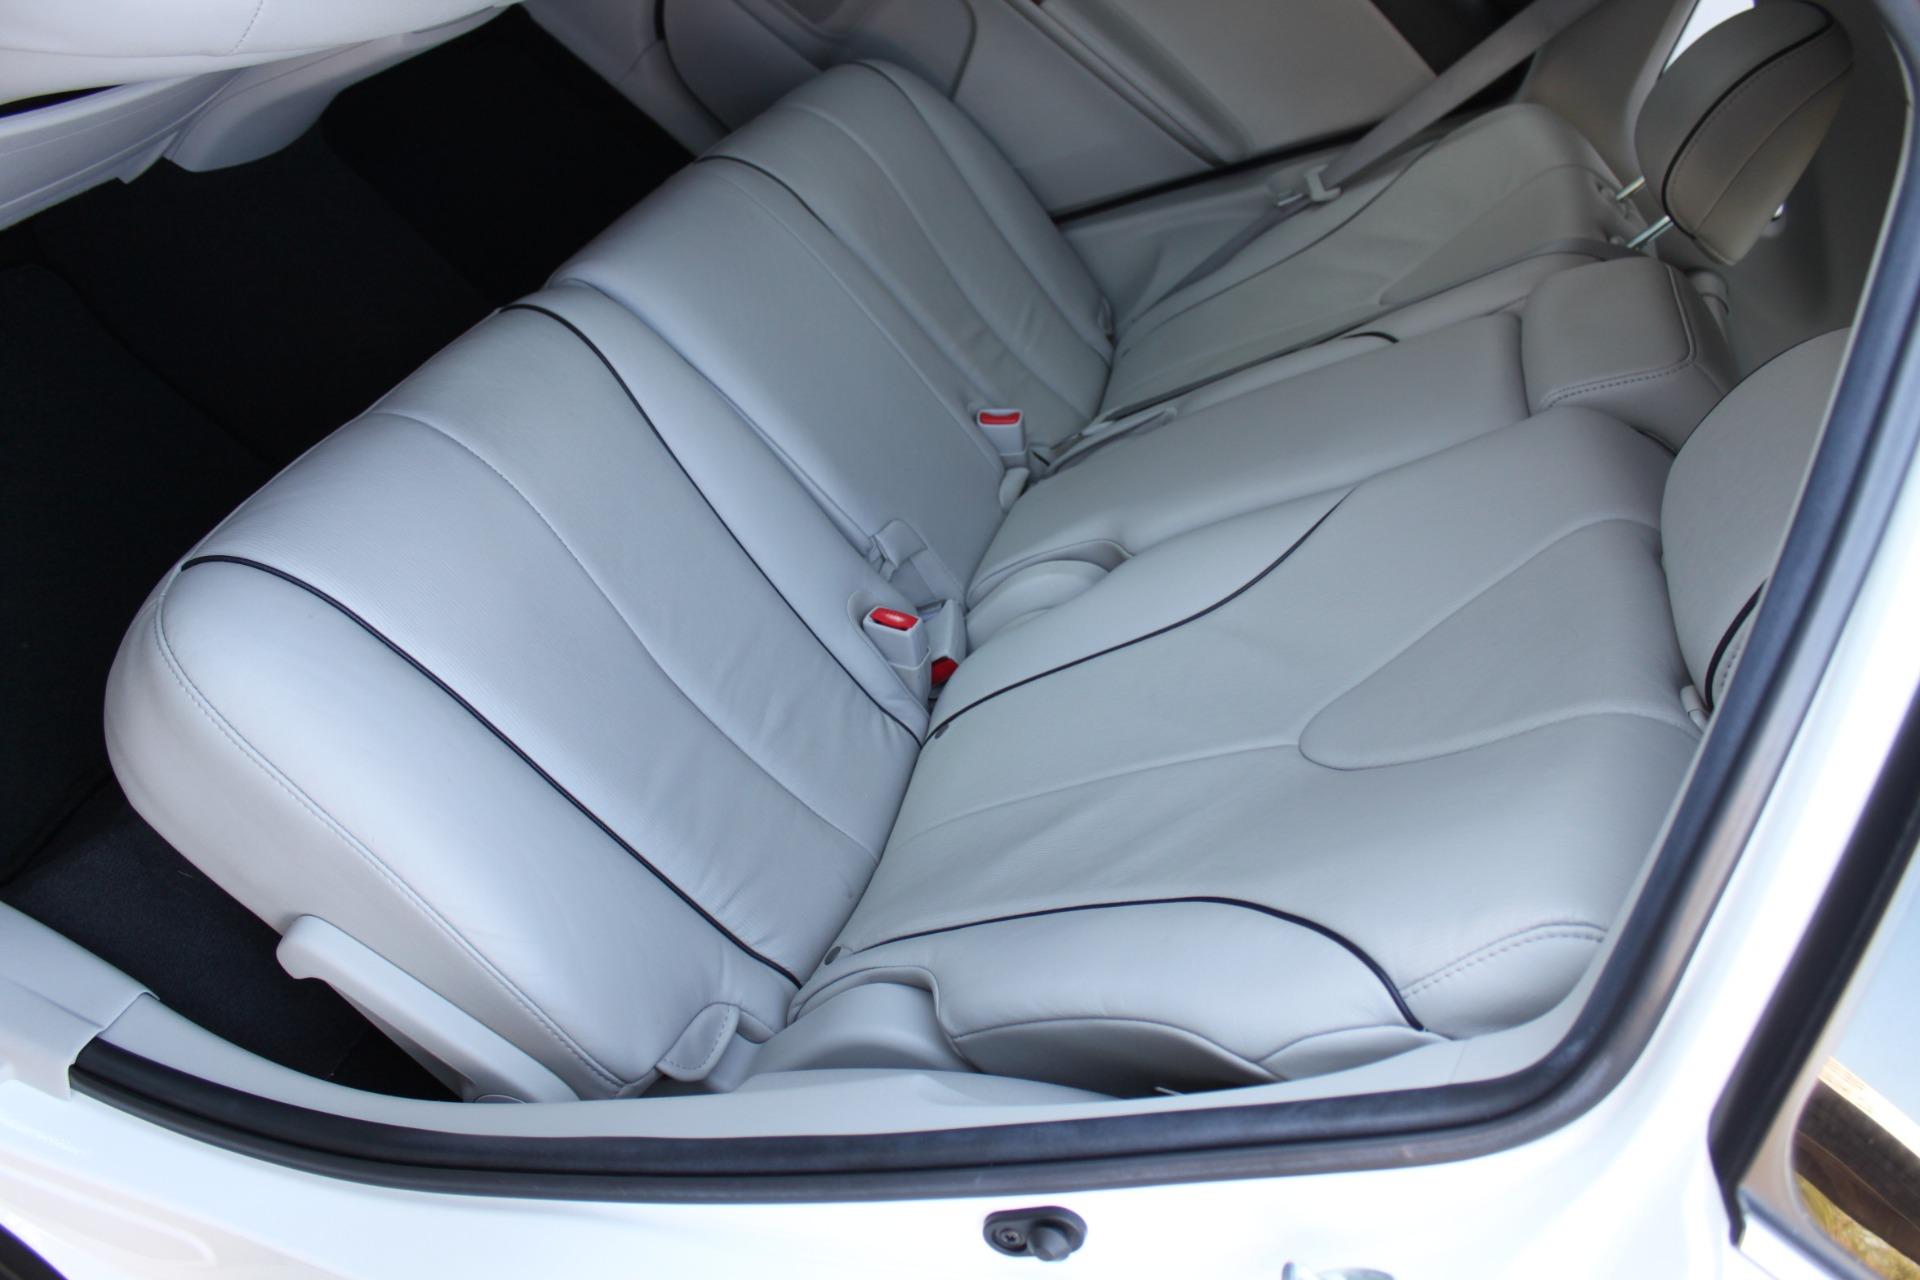 Used-2012-Toyota-Venza-XLE-Grand-Cherokee